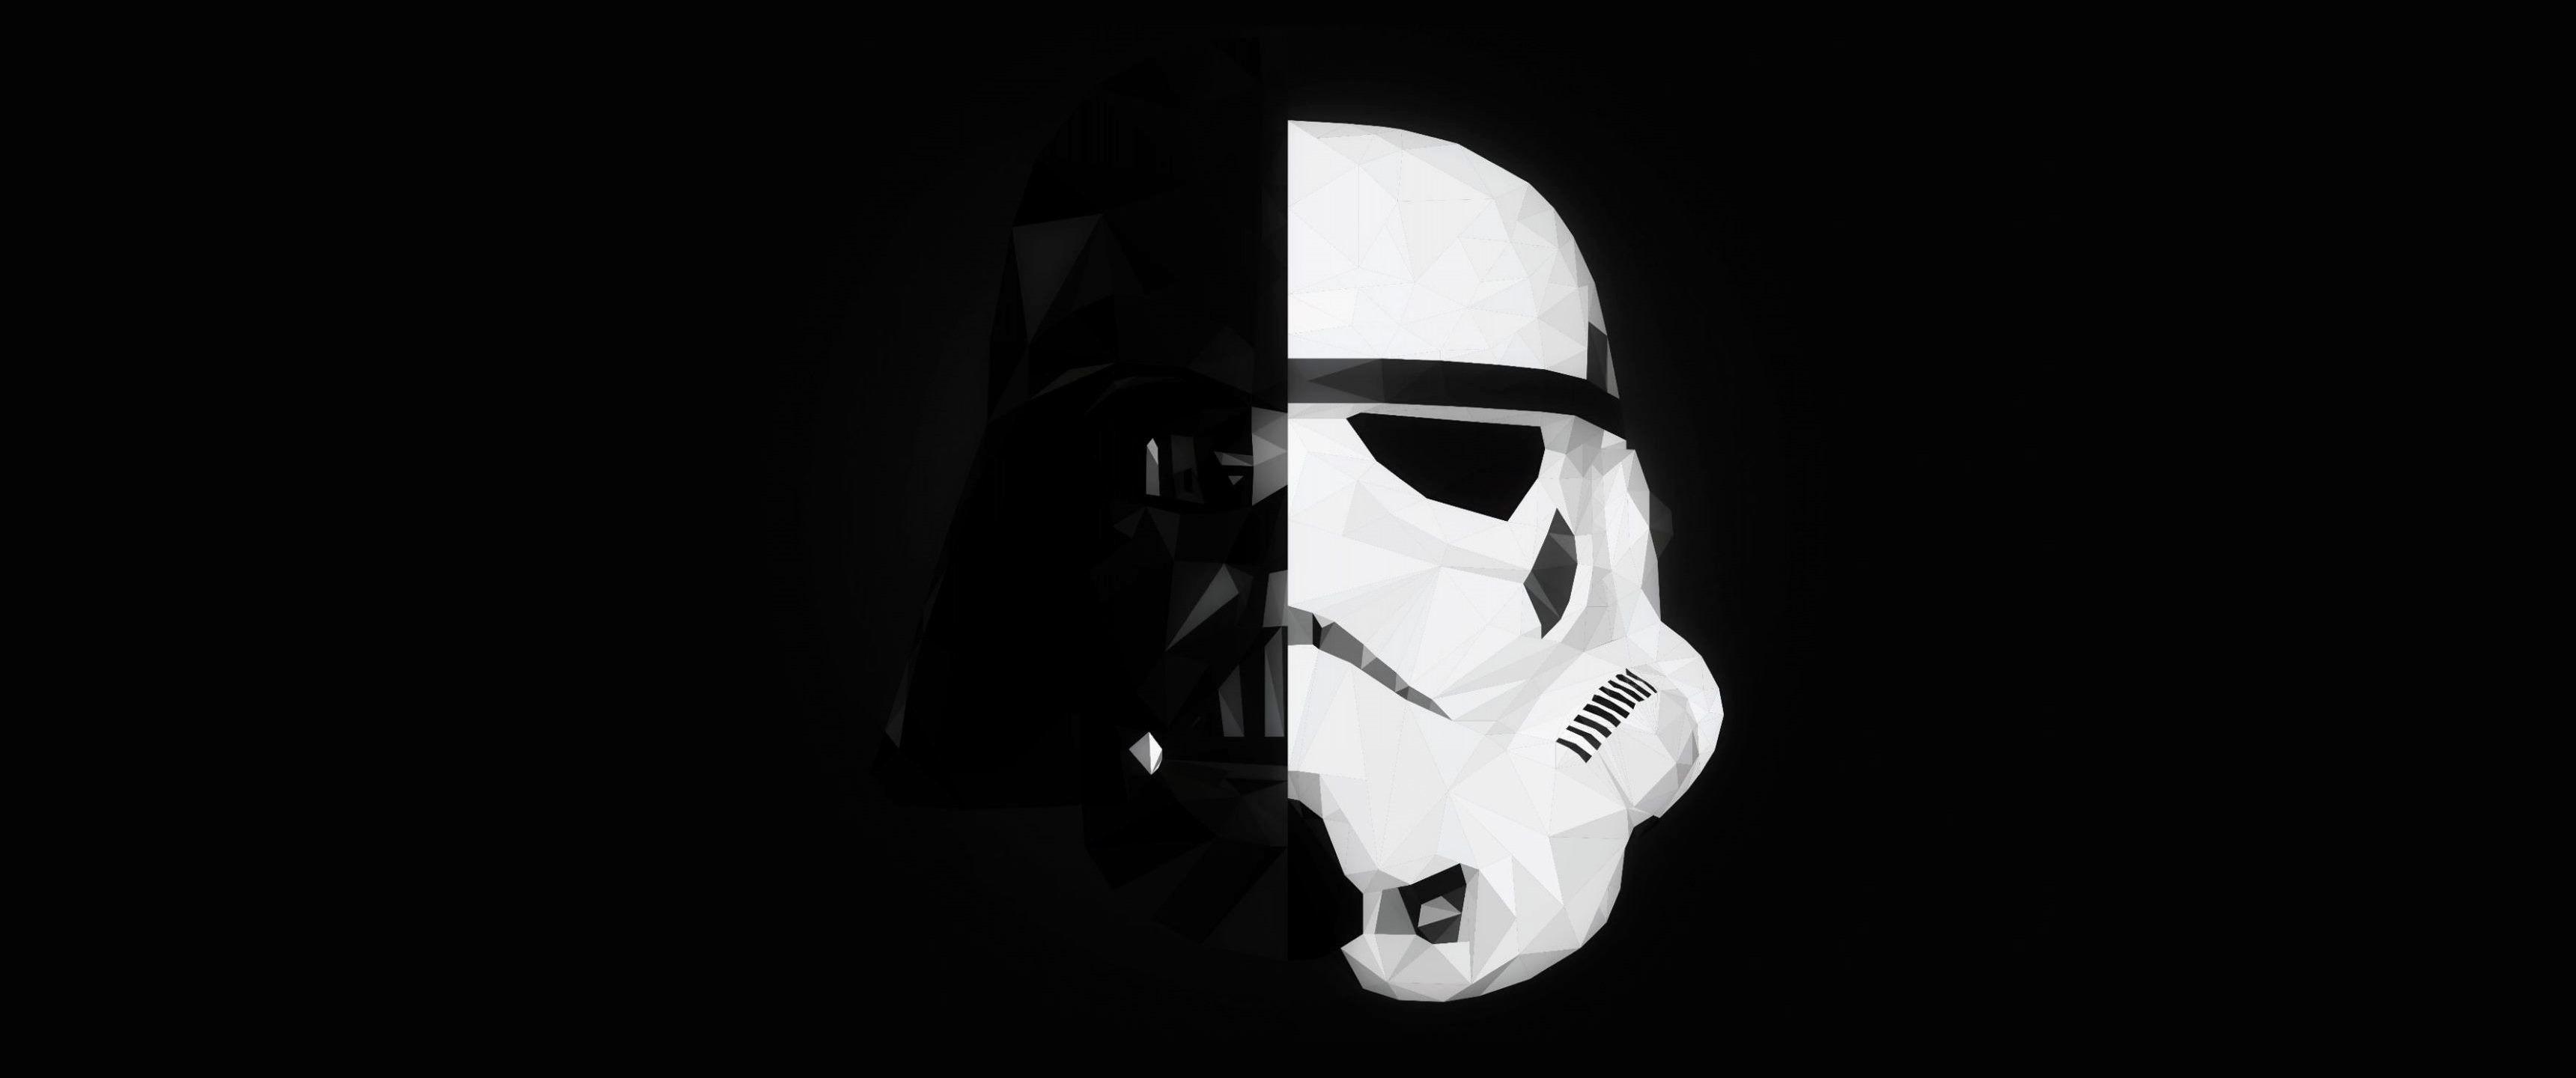 Stormtrooper wallpapers - HD wallpaper